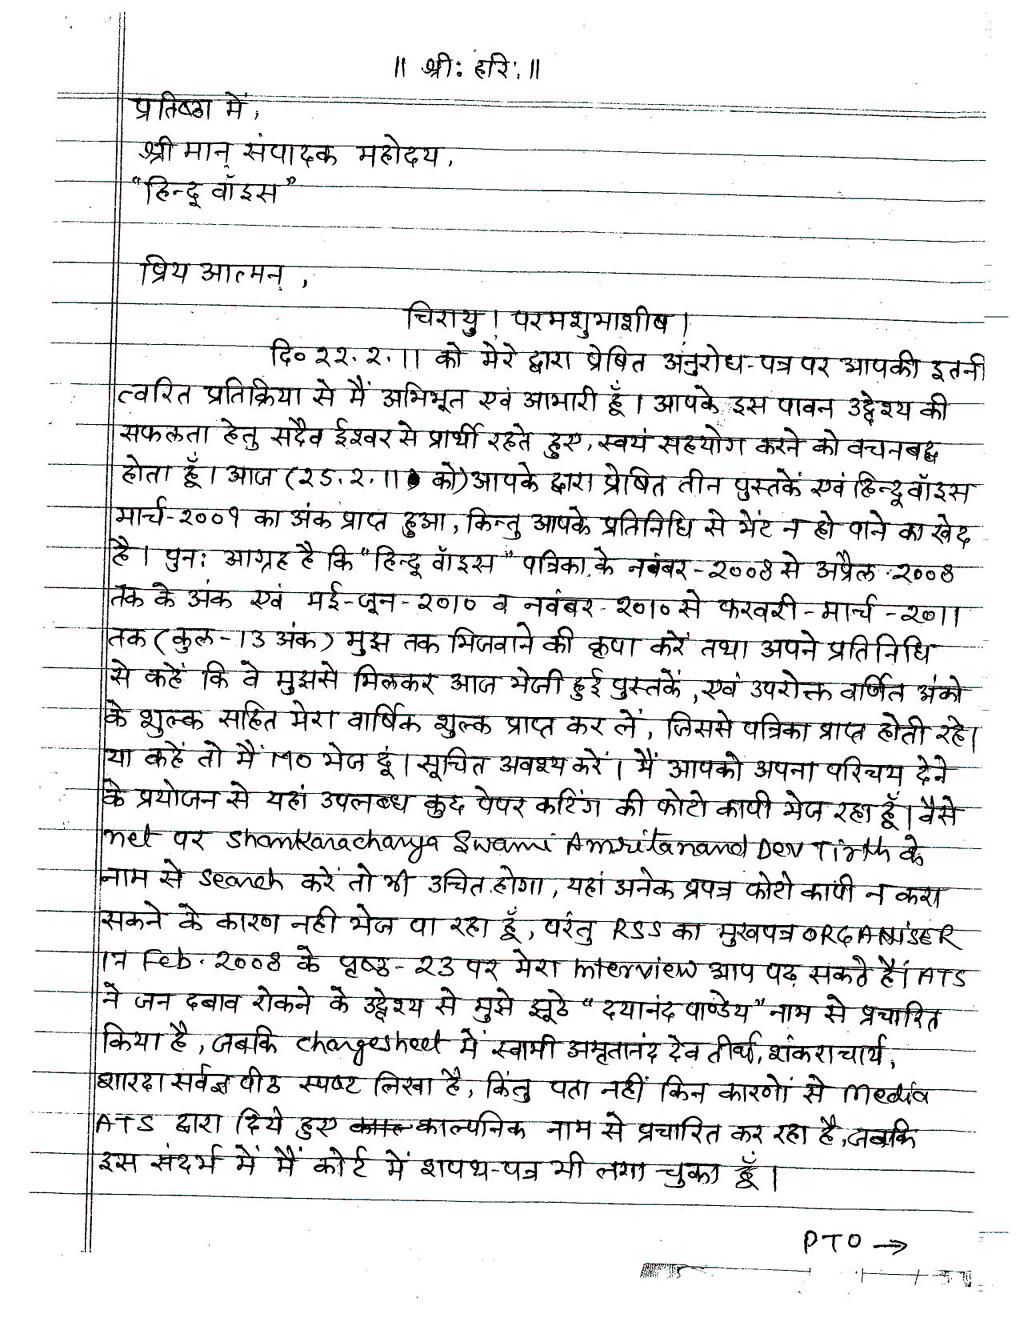 Indira gandhi essay in hindi. Mahatma Gandhi Photo Gallery : 1869 ...